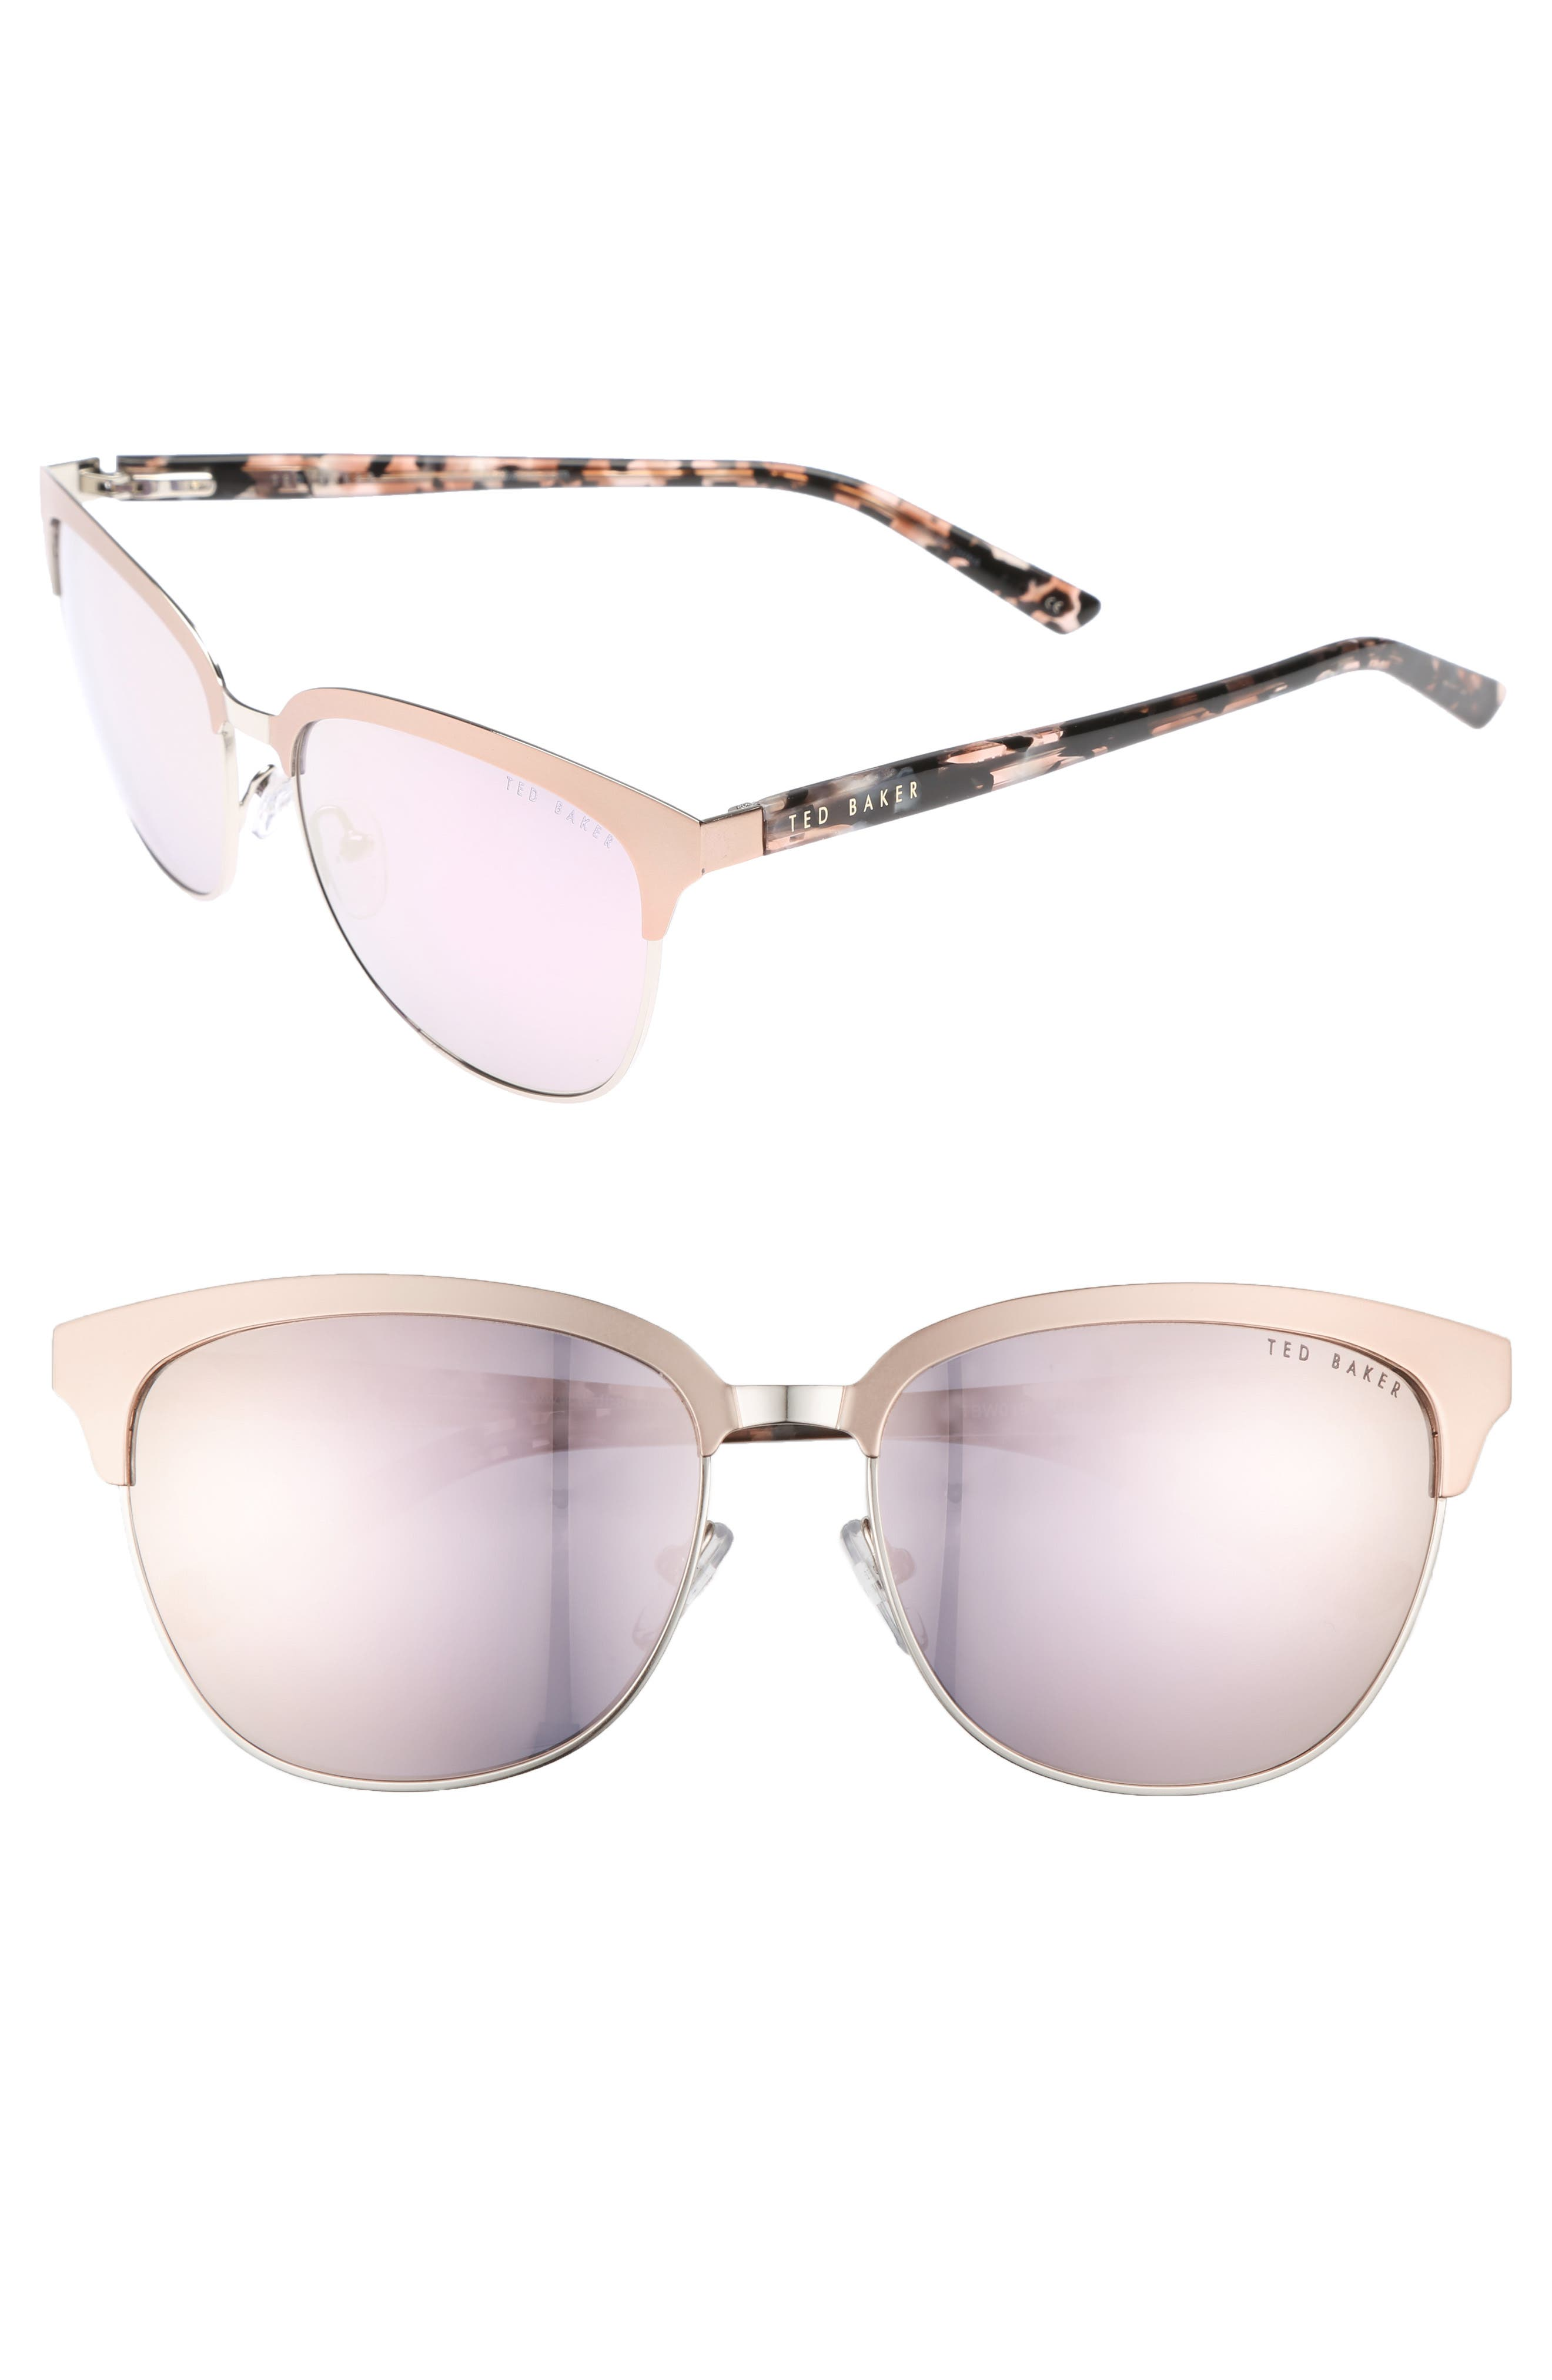 Main Image - Ted Baker London 57mm Mirrored Sunglasses